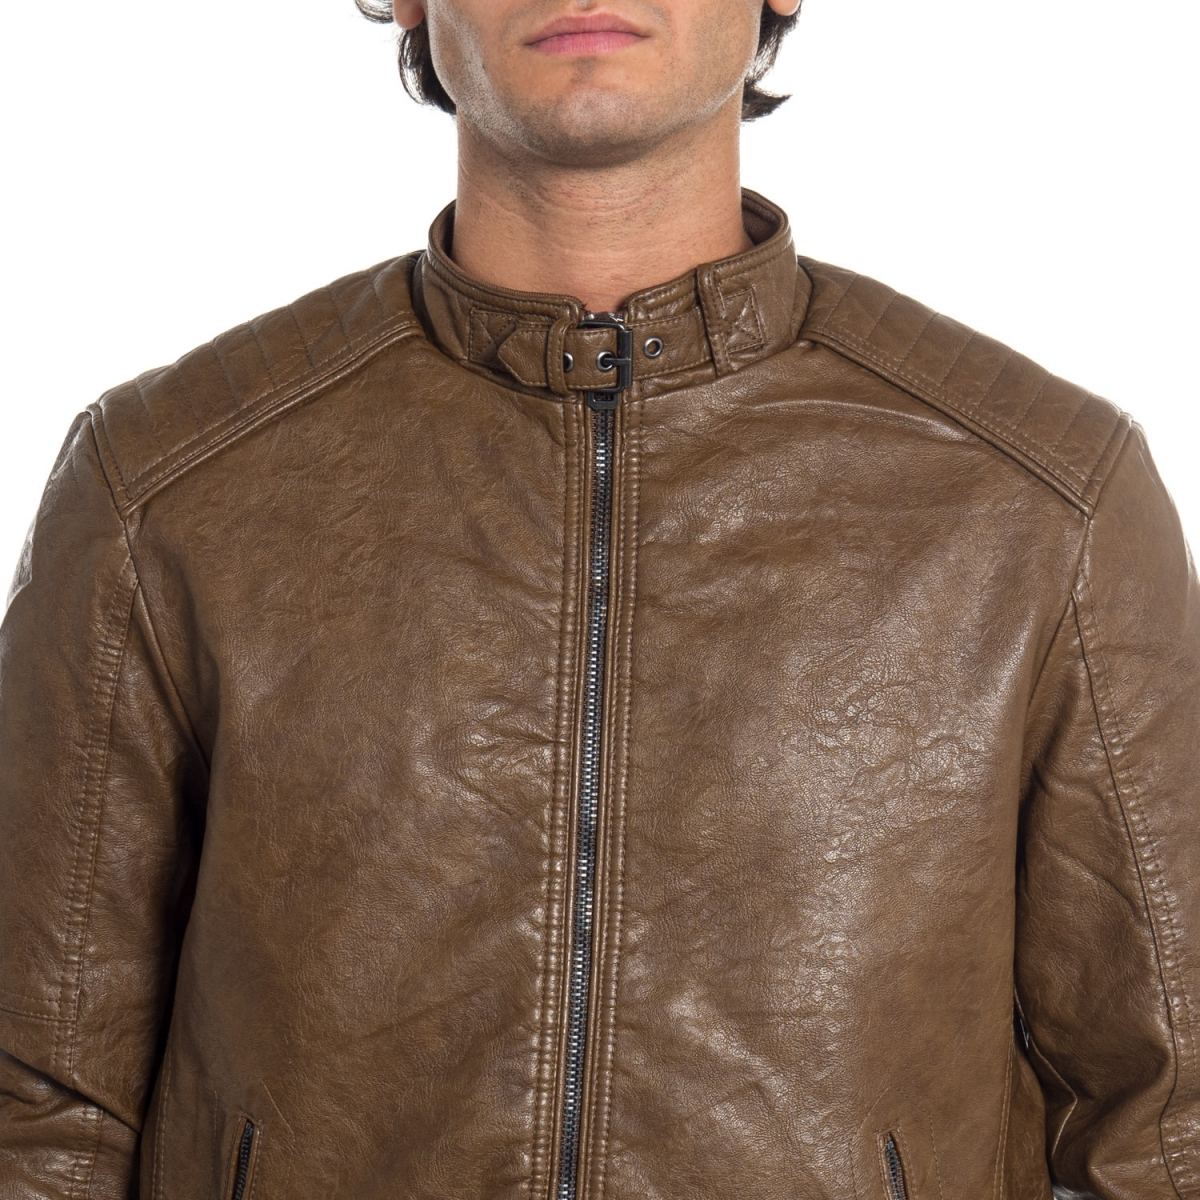 abbigliamento Giubbini uomo Giubbino biker in pelle LPP1760 LANDEK PARK Cafedelmar Shop